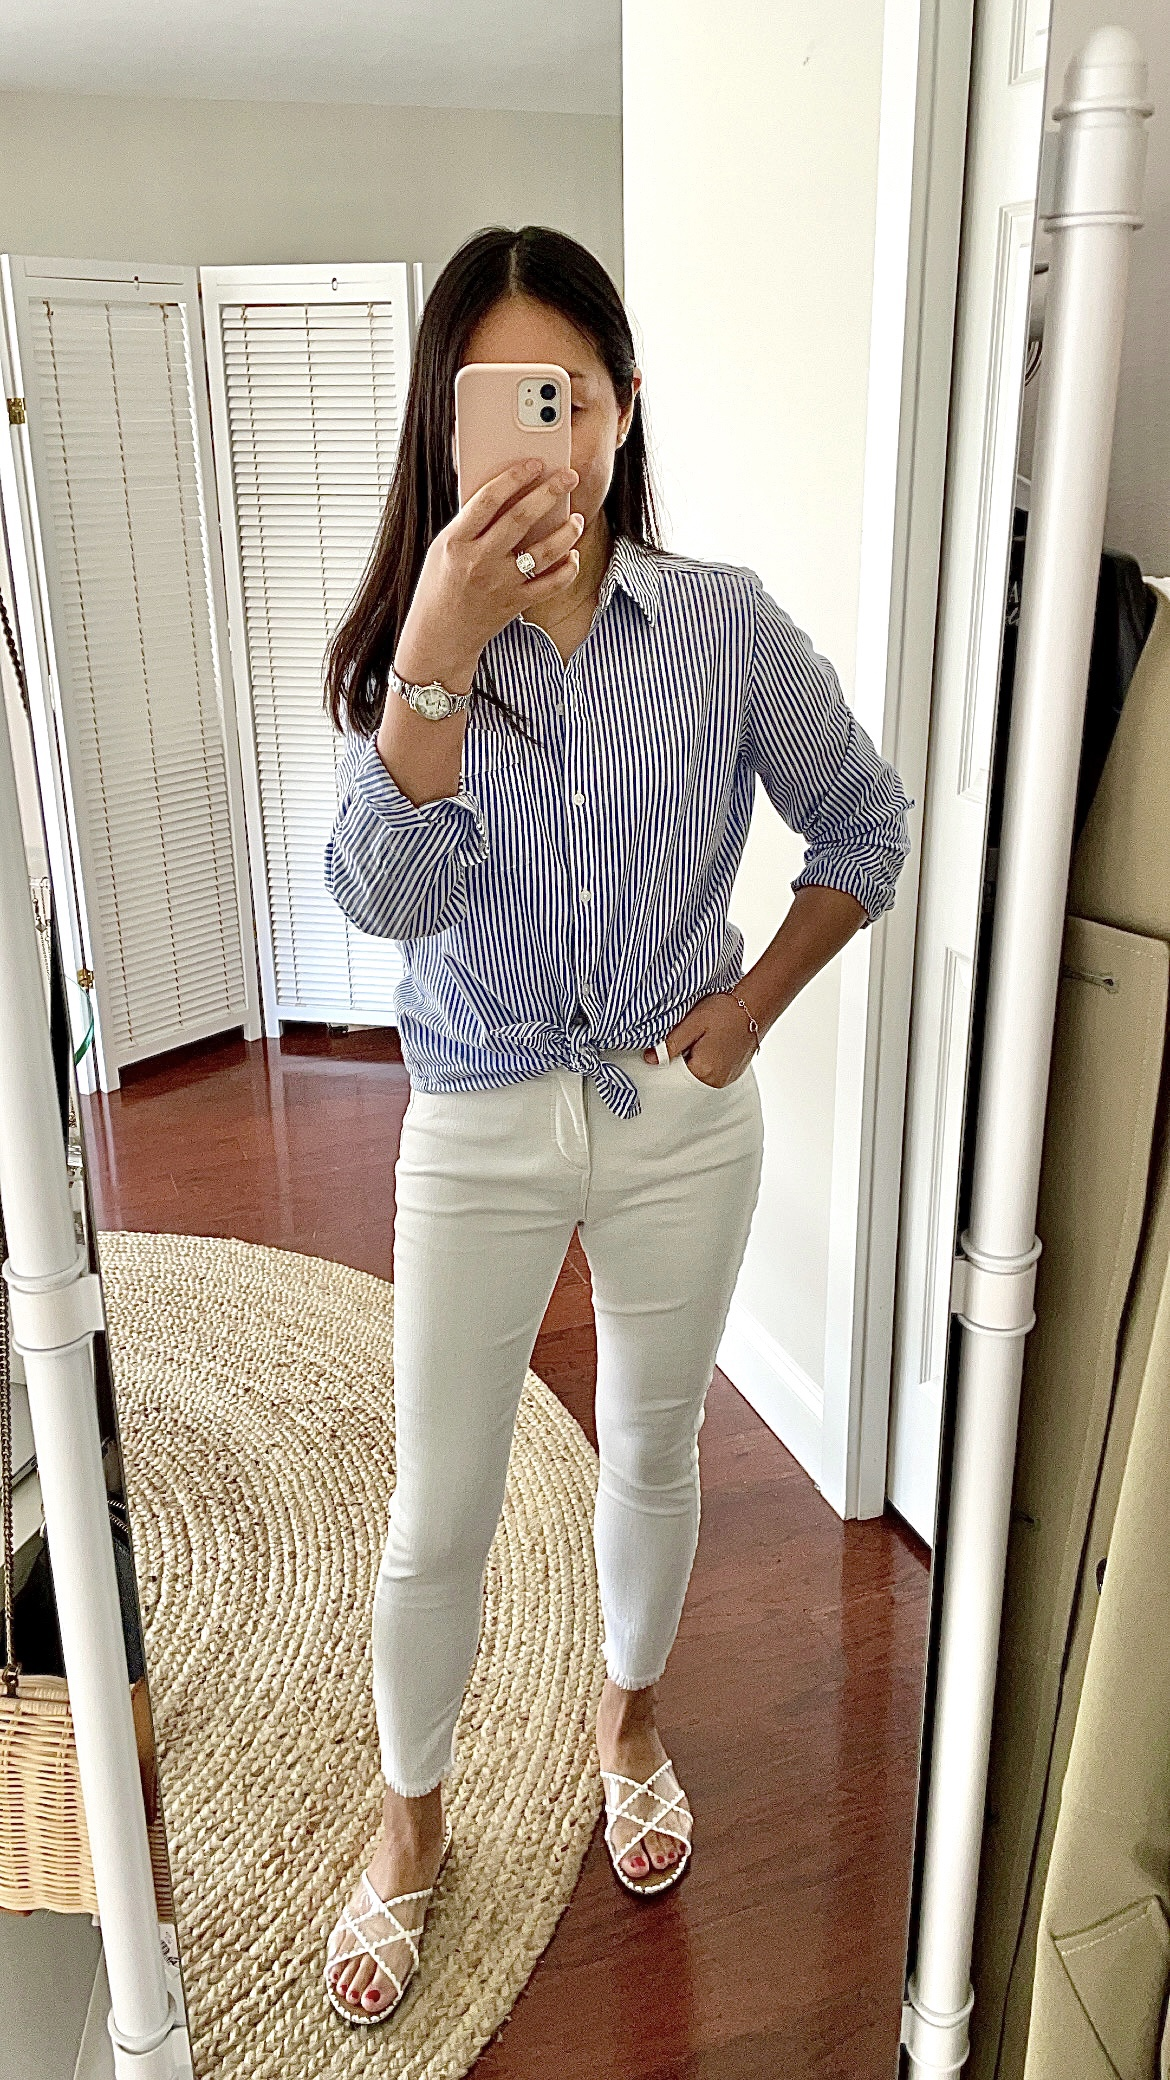 Goodthreads Women's Washed Cotton Boyfriend Shirt, size S